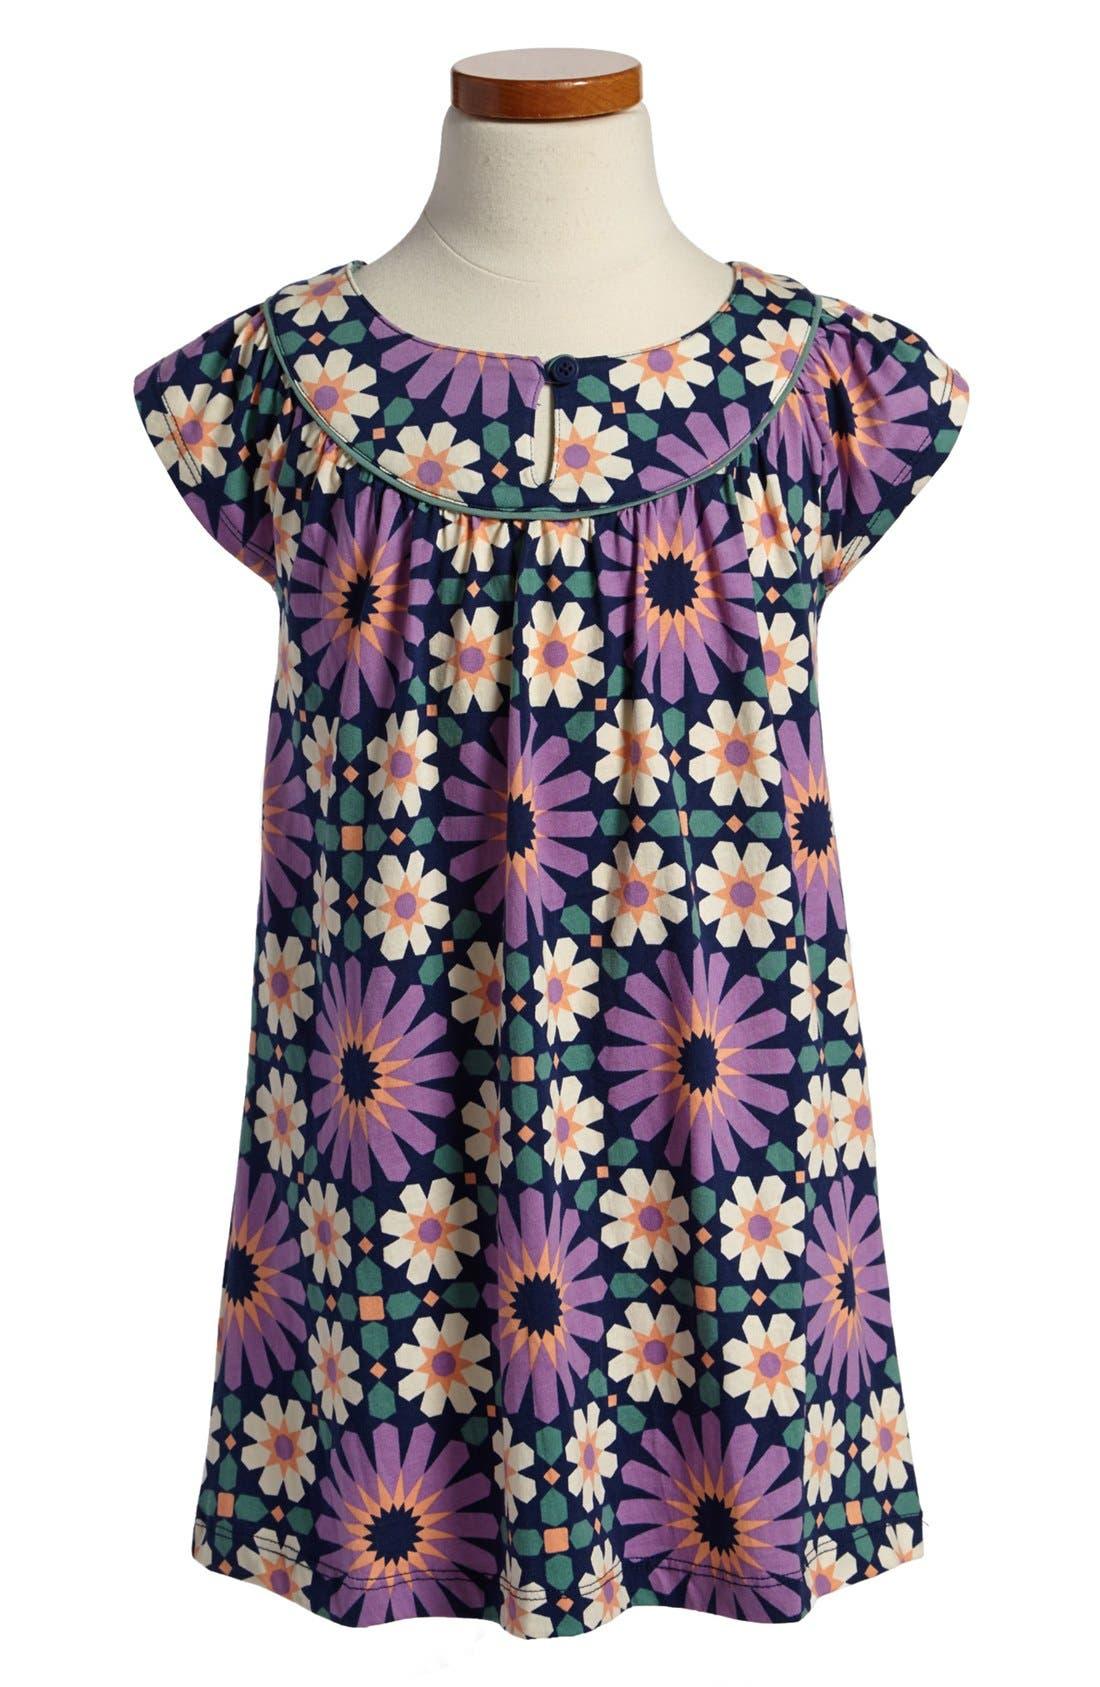 Main Image - Tea Collection 'Fes' Tile Print Dress (Little Girls & Big Girls)